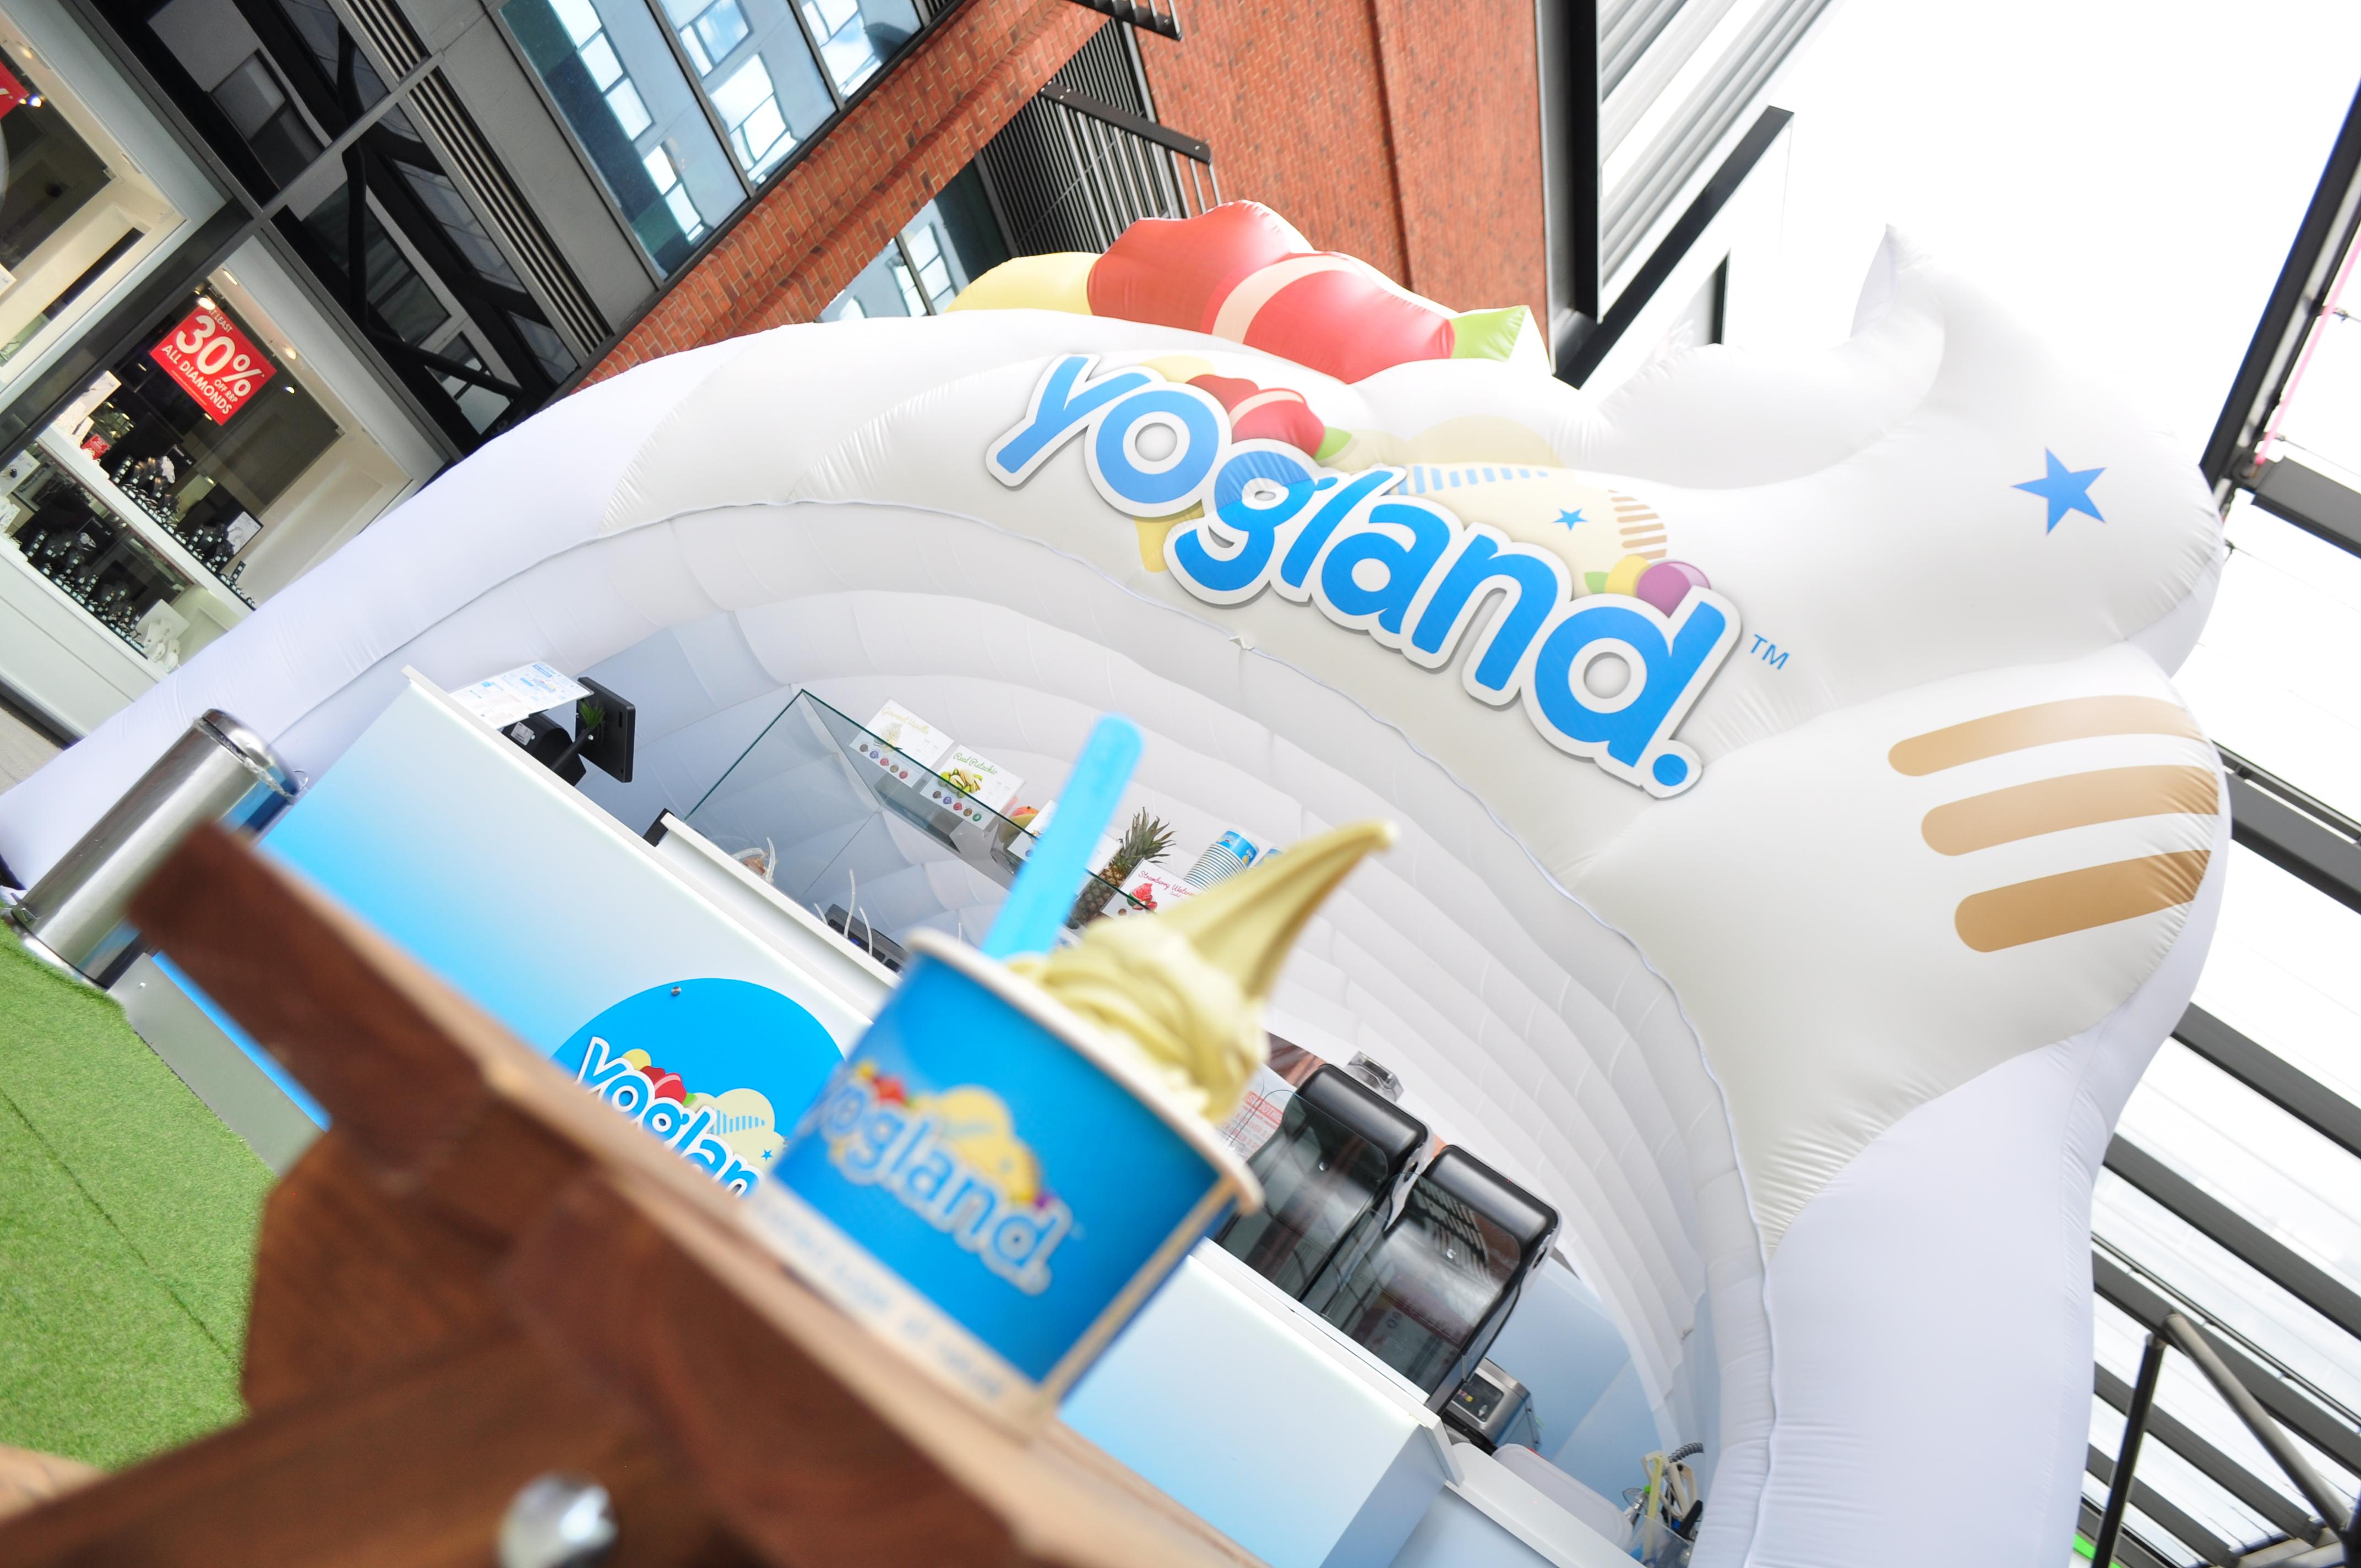 Yogland Summer Pop Up